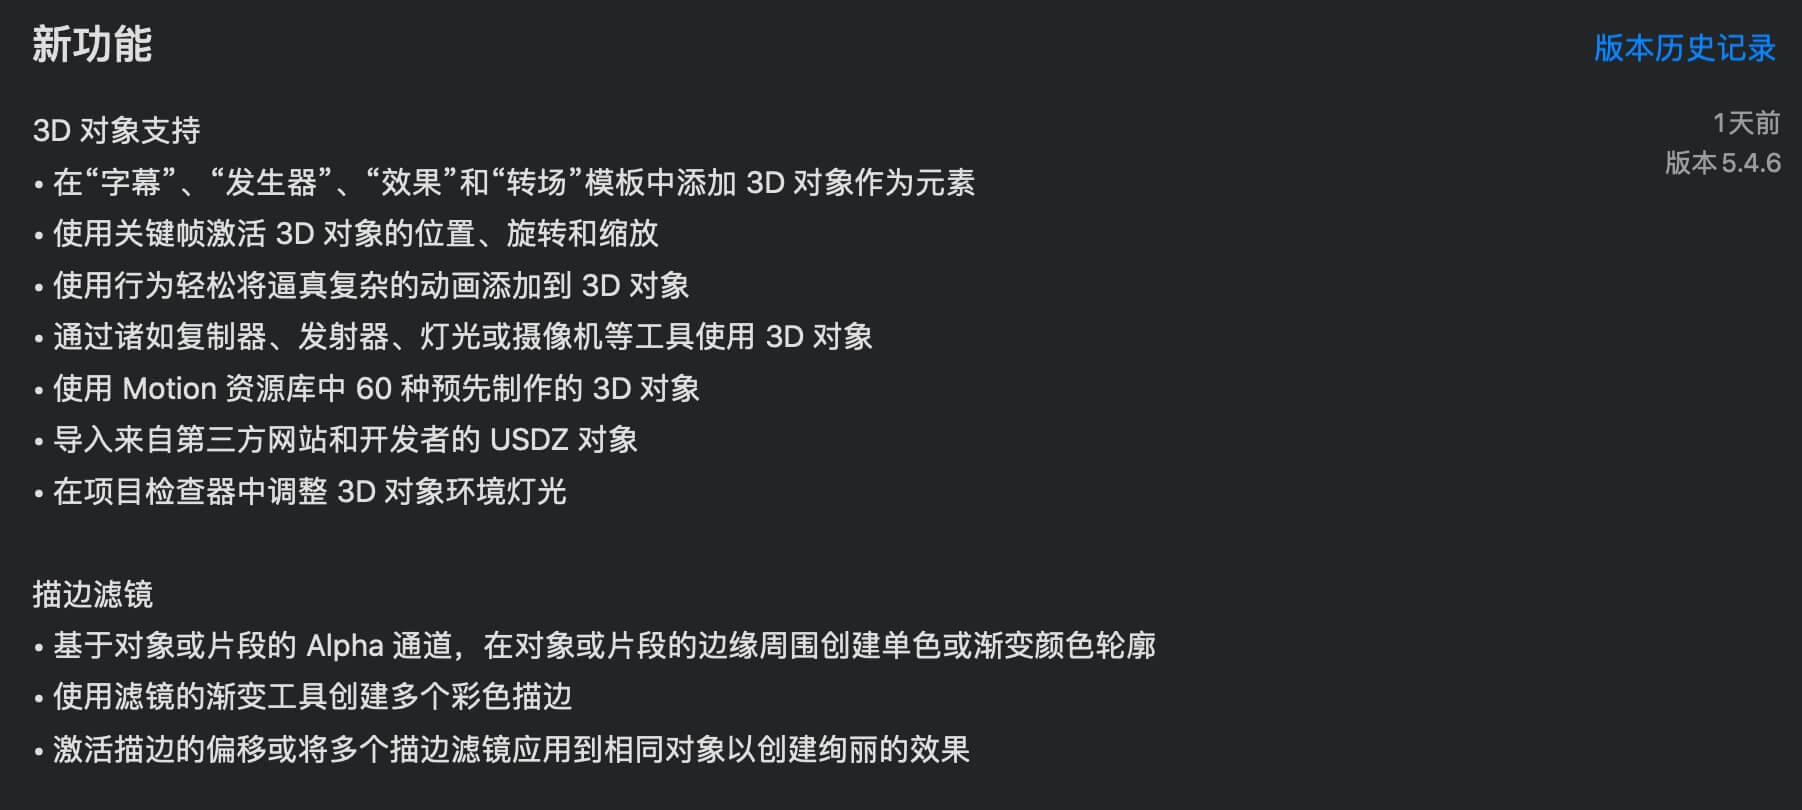 Apple Motion 5.4.6 破解版免费下载 中英文版 苹果视频剪辑软件